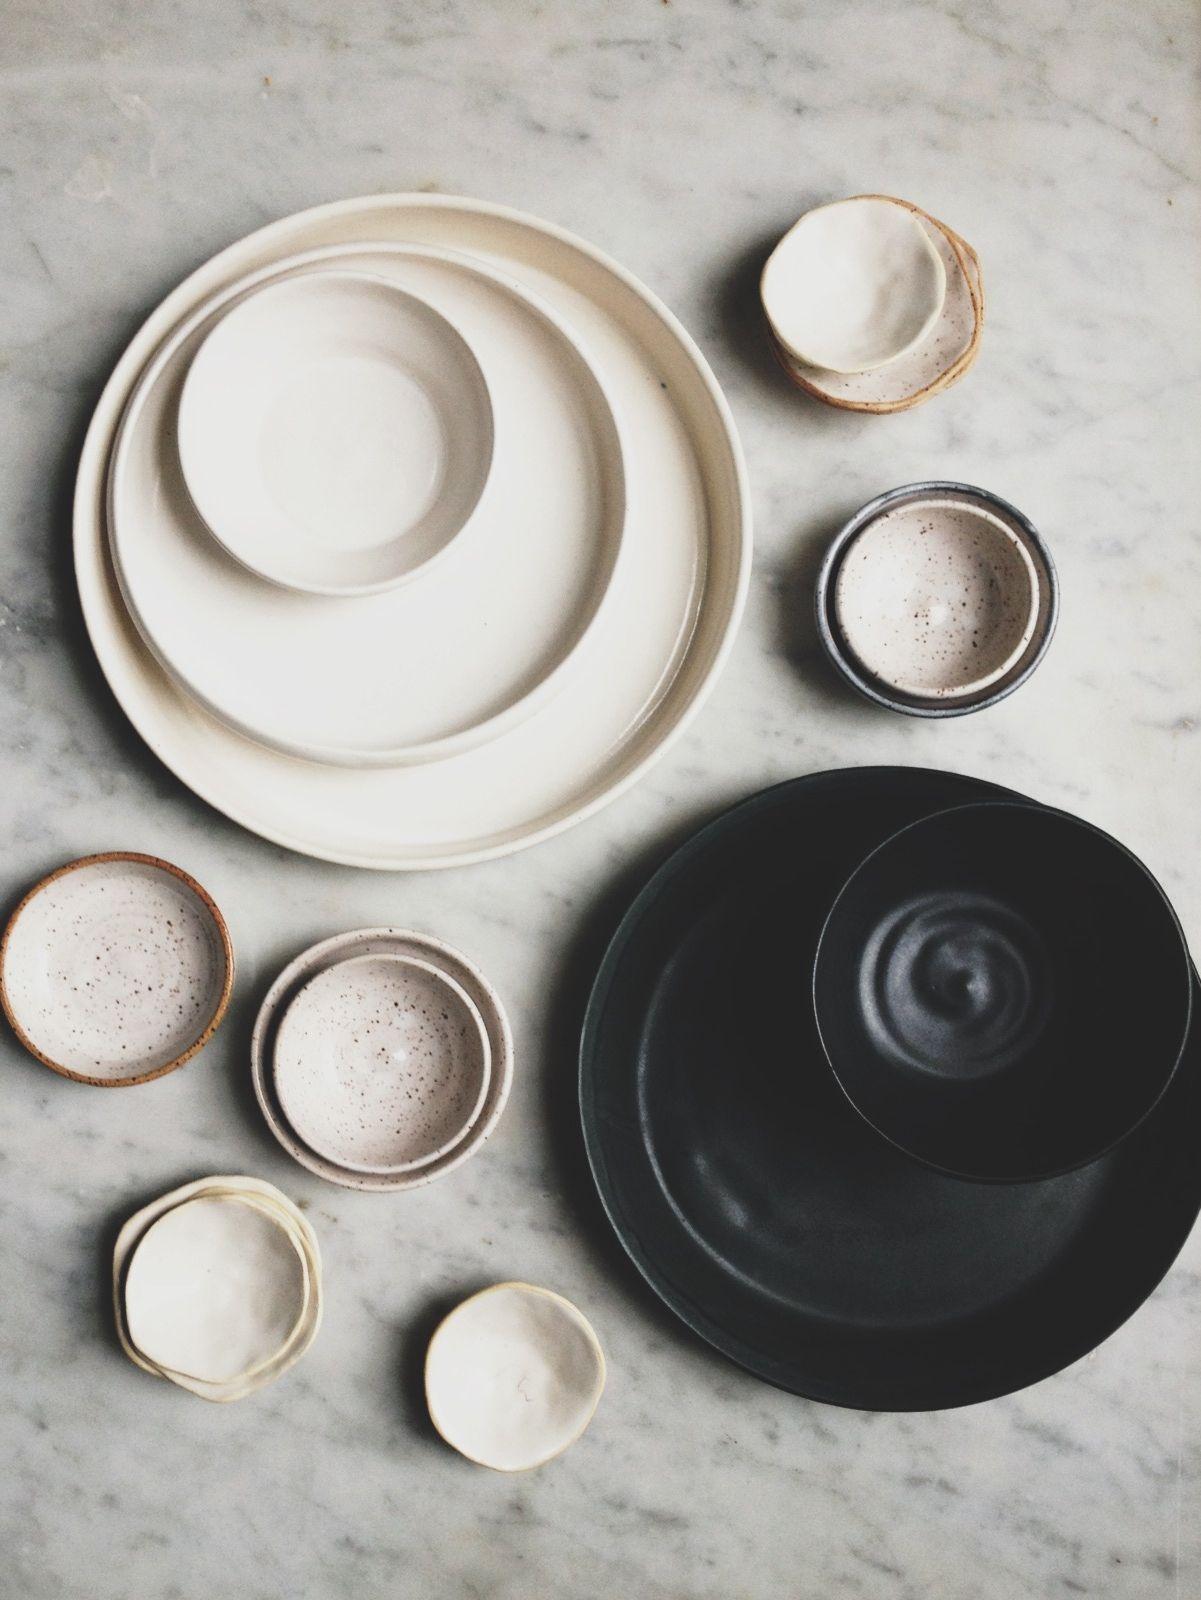 Simple earthenware